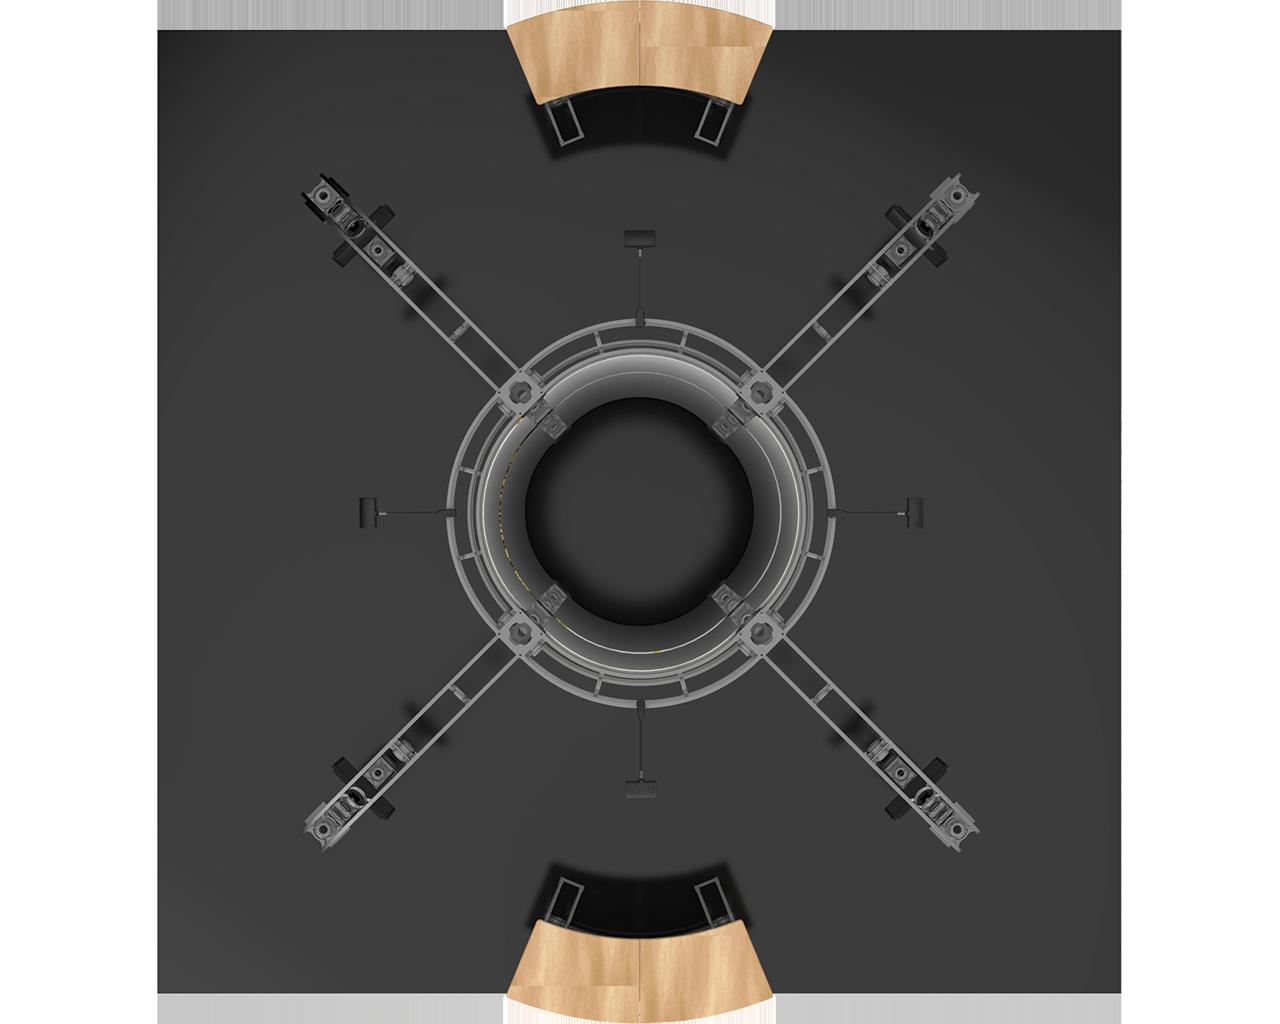 Vesta 20 x 20 Orbital Truss Display